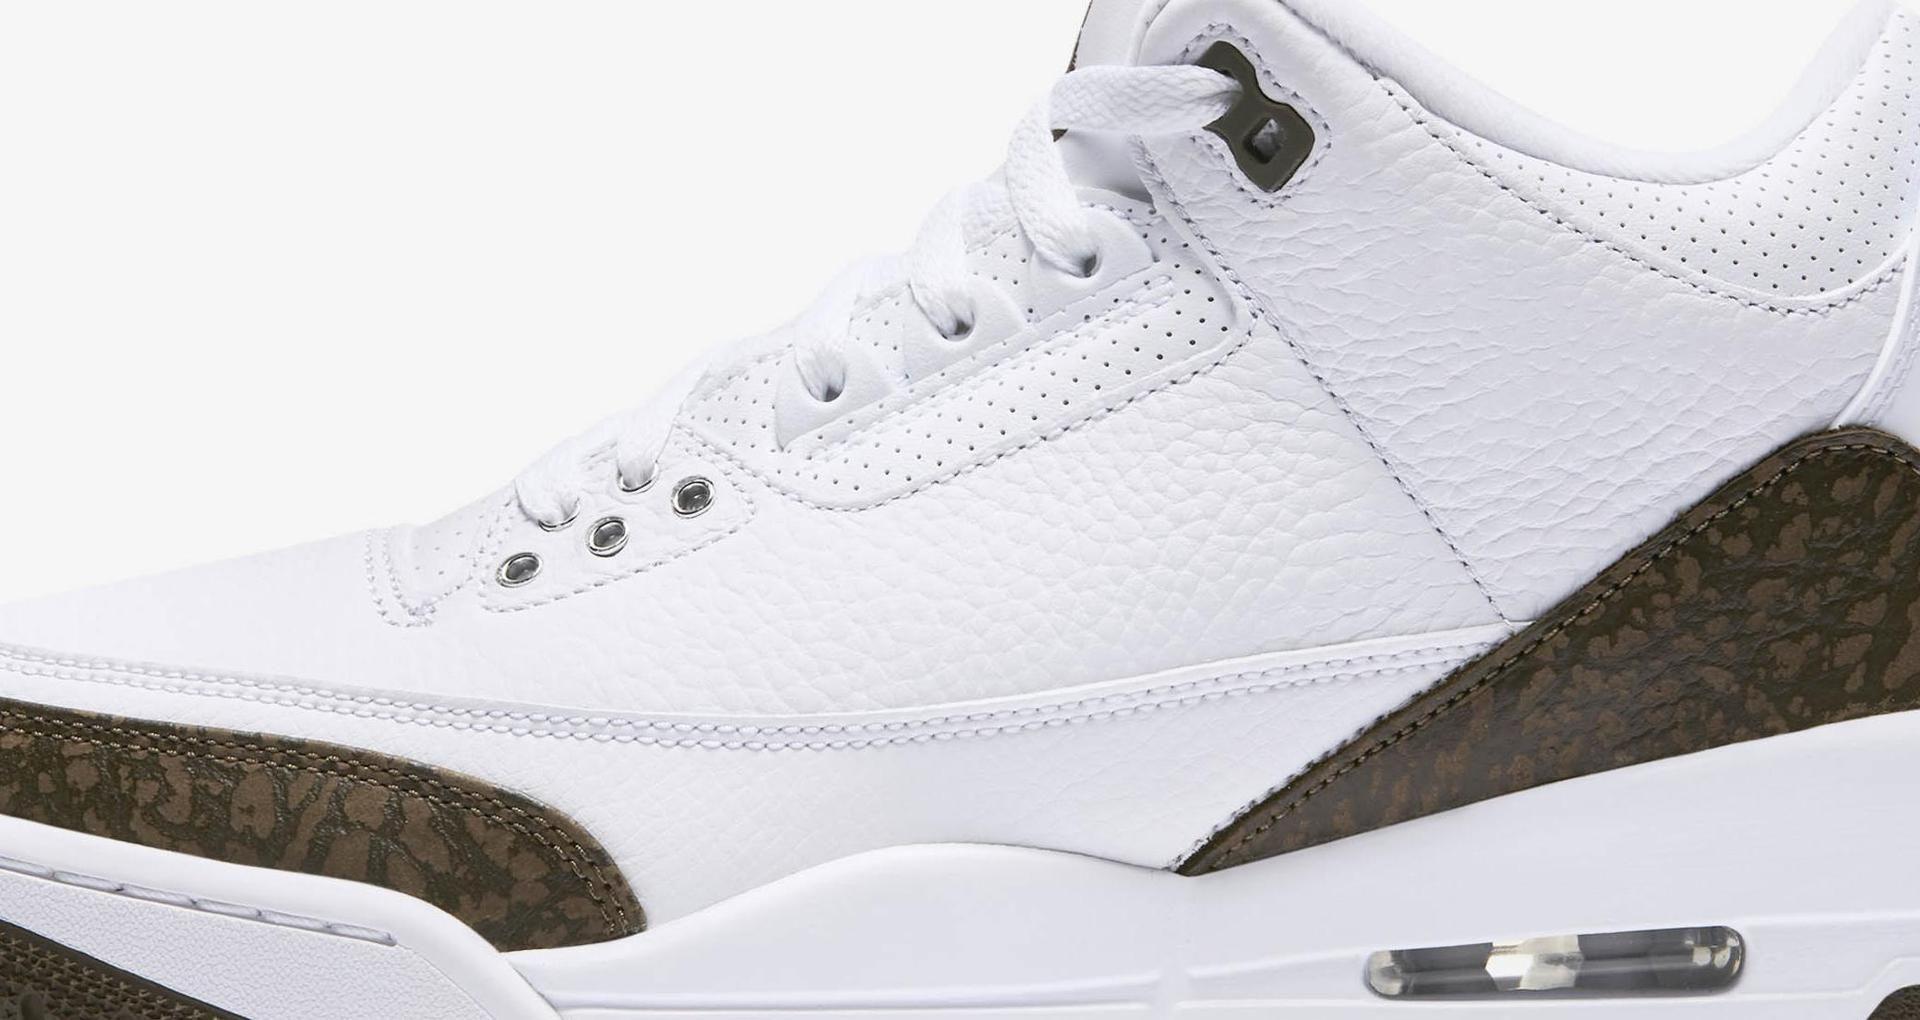 competitive price 31c73 f2339 Air Jordan 3 Retro  White   Chrome   Dark Mocha  Release Date